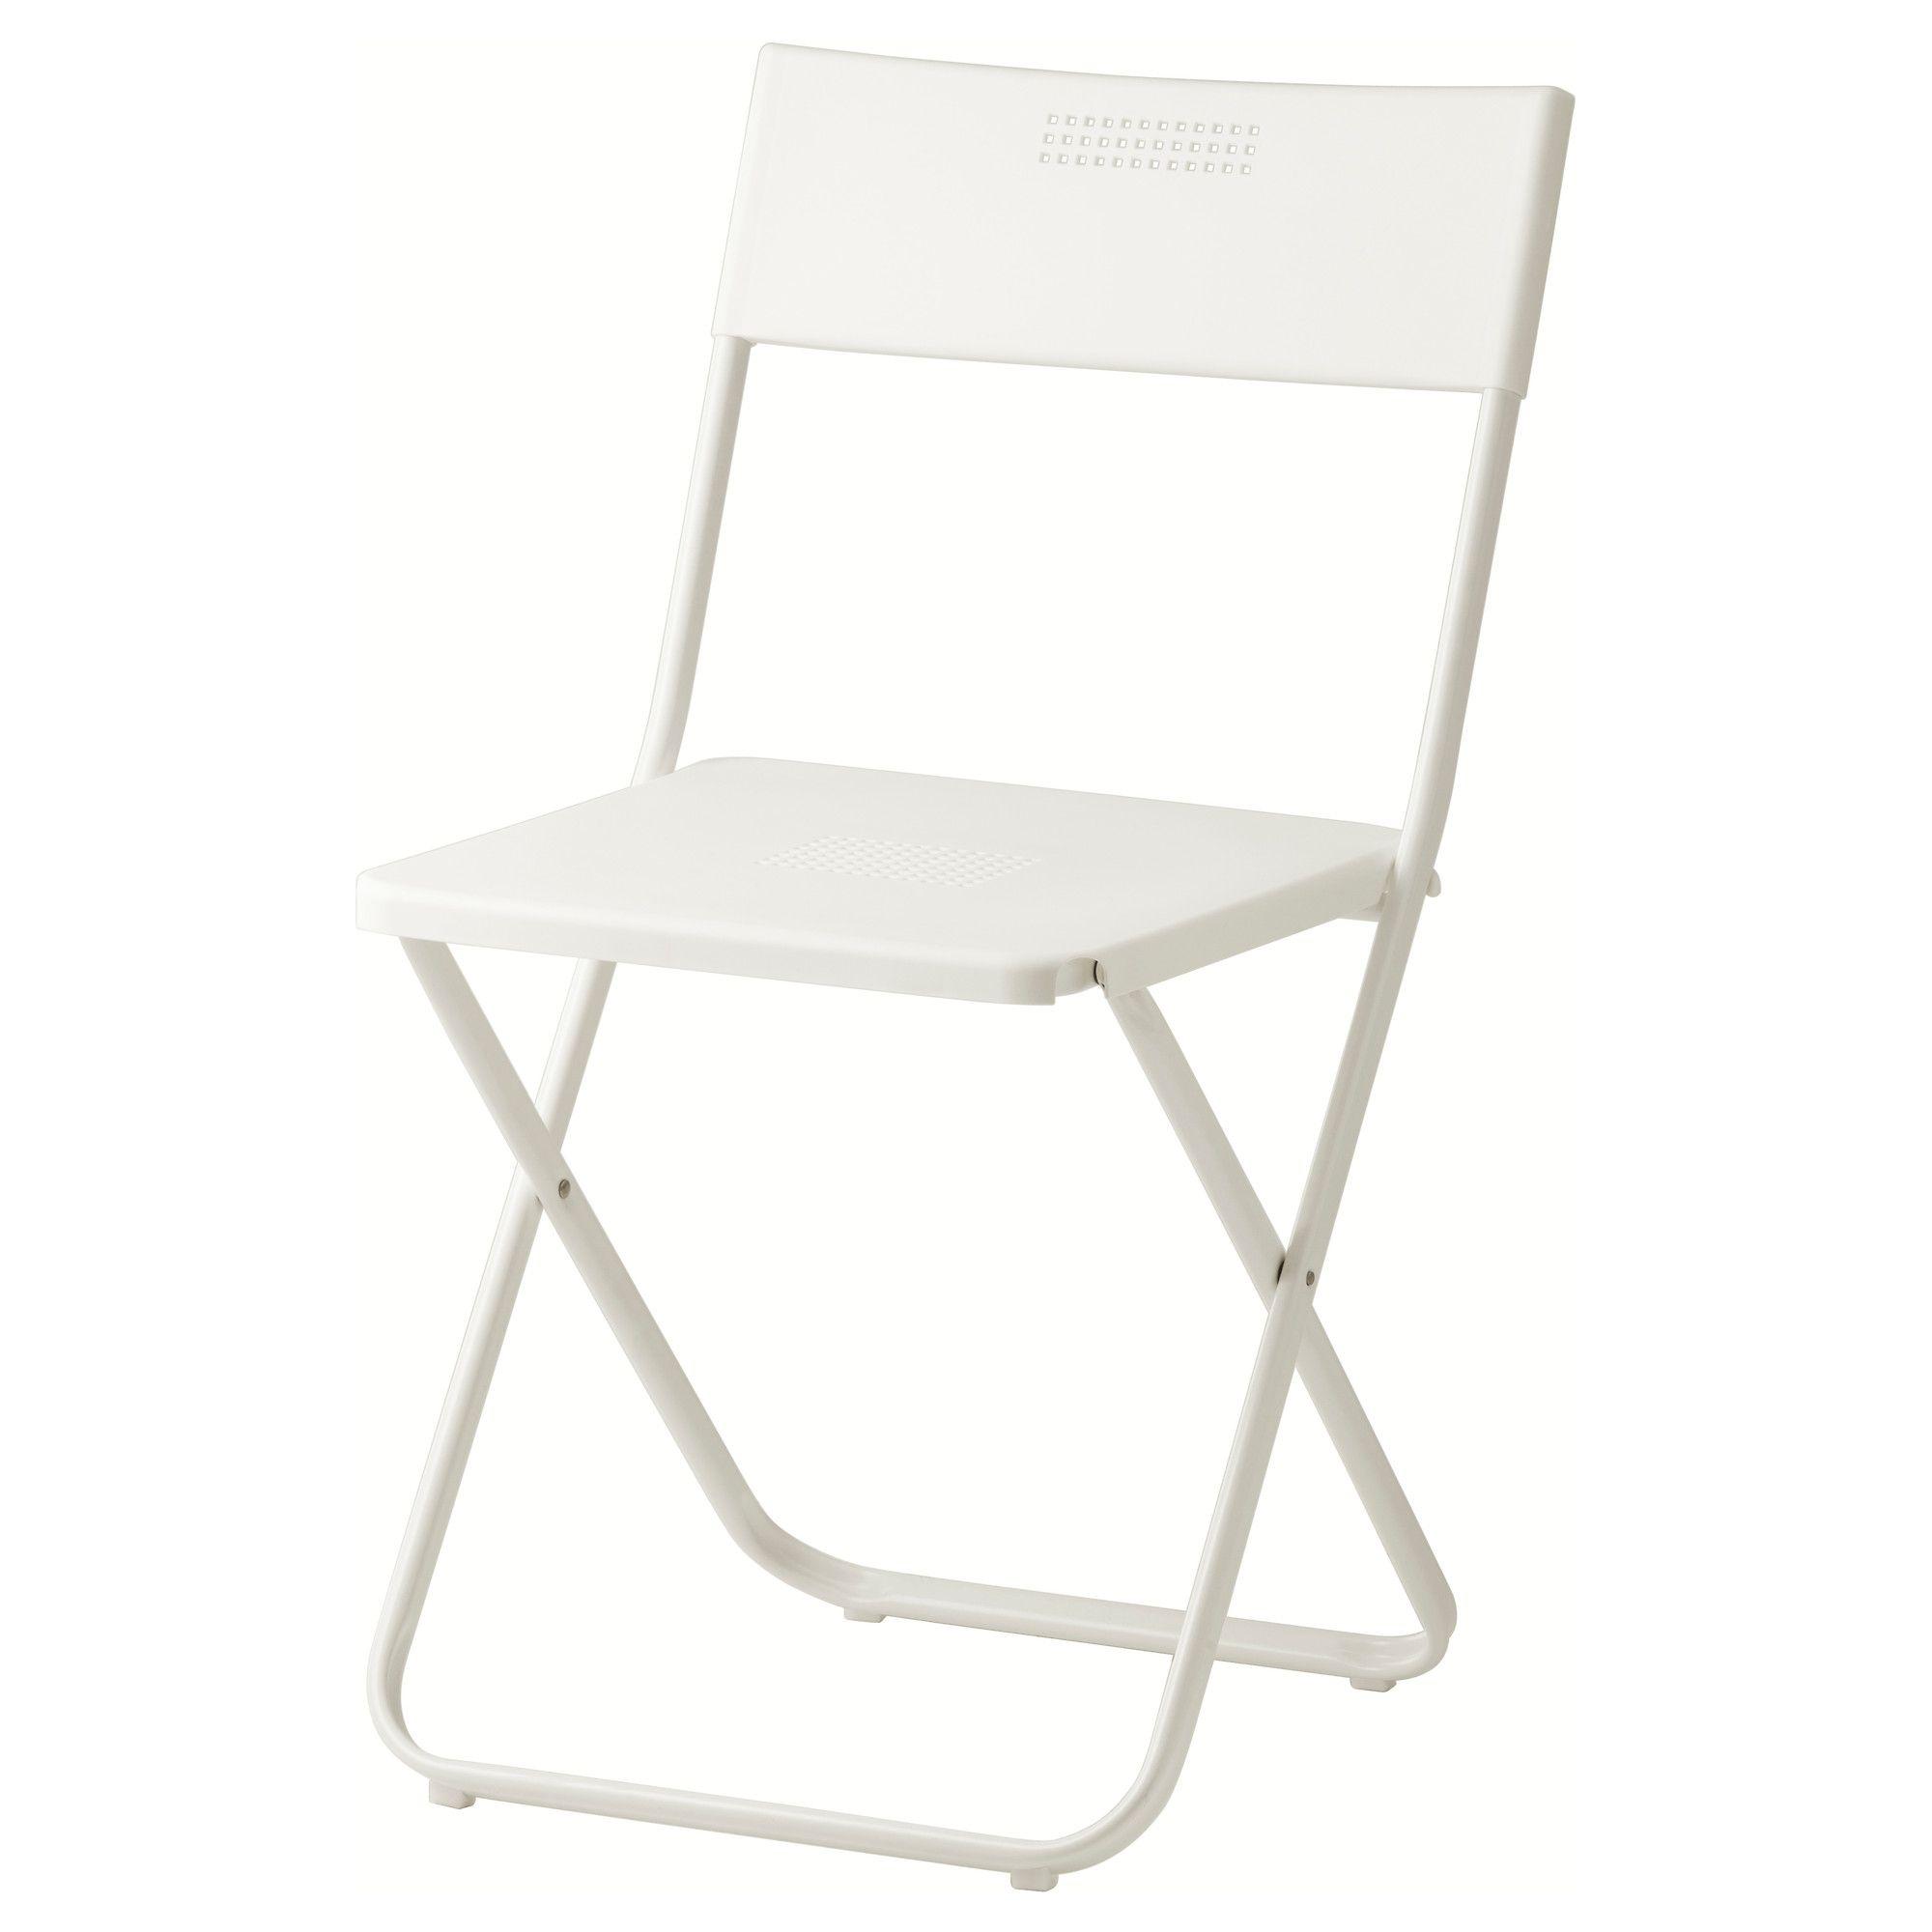 Us Furniture And Home Furnishings Ikea Outdoor Outdoor Dining Chairs Outdoor Folding Chairs